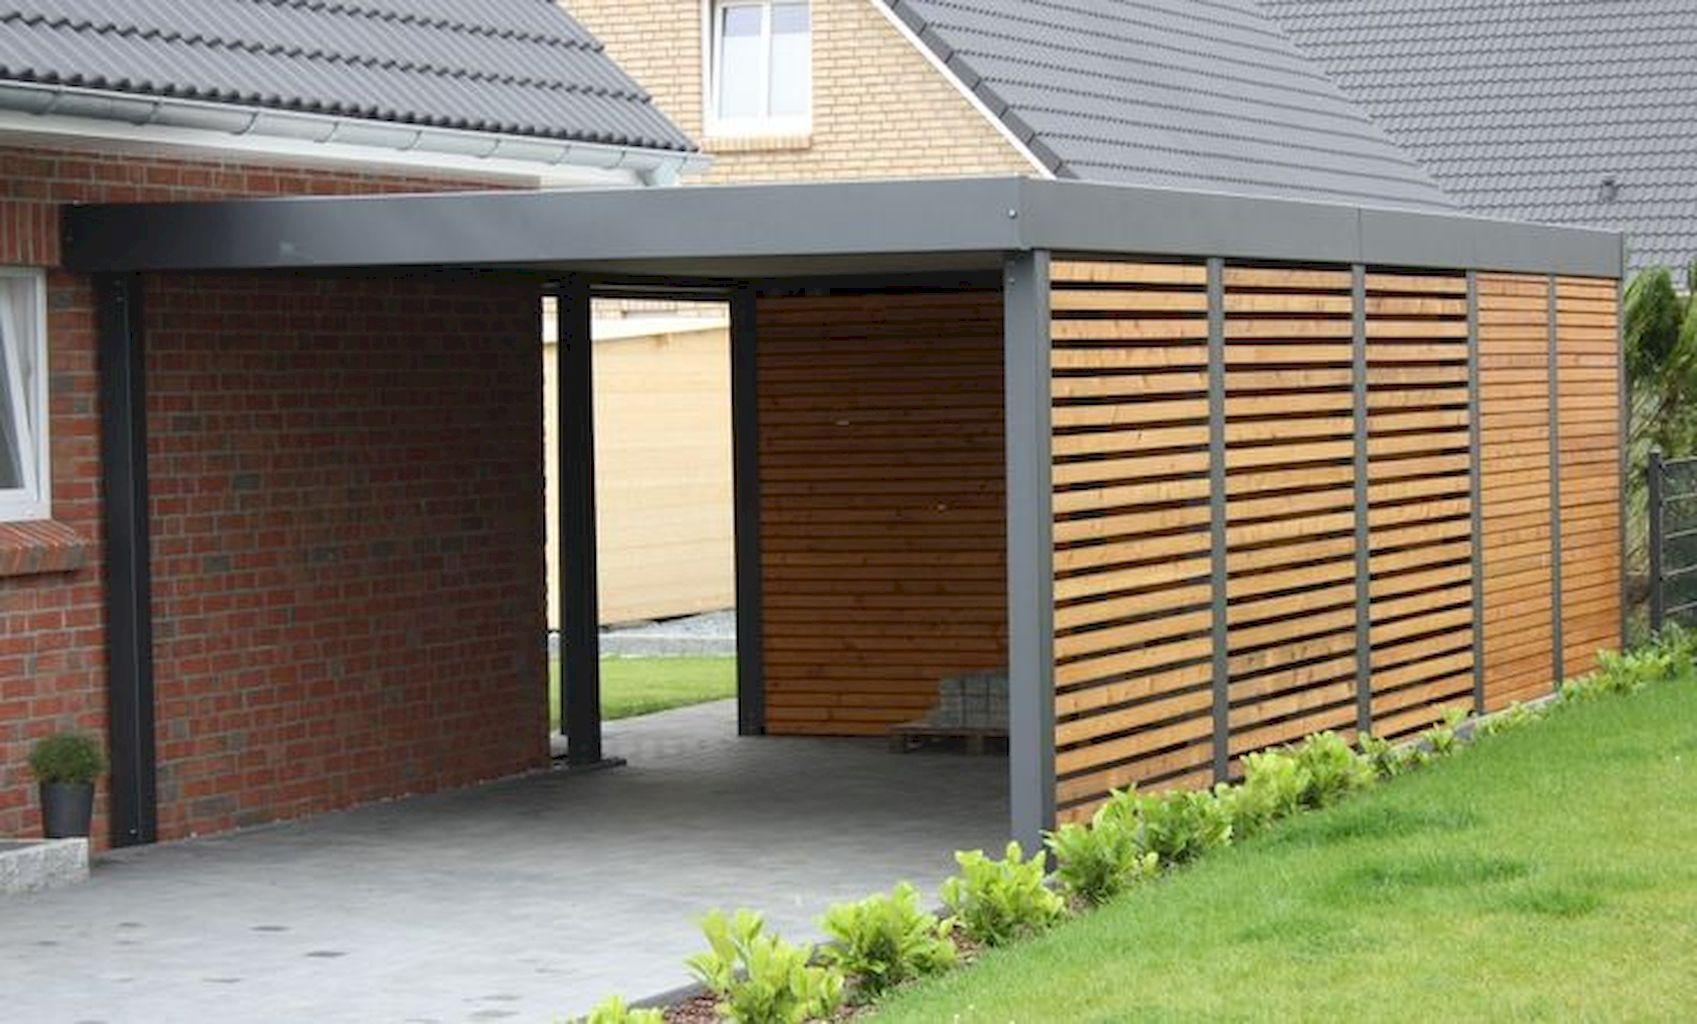 Adorable Modern Carports Garage Designs Ideas 7 Modern Carport Carport Designs Carport Garage